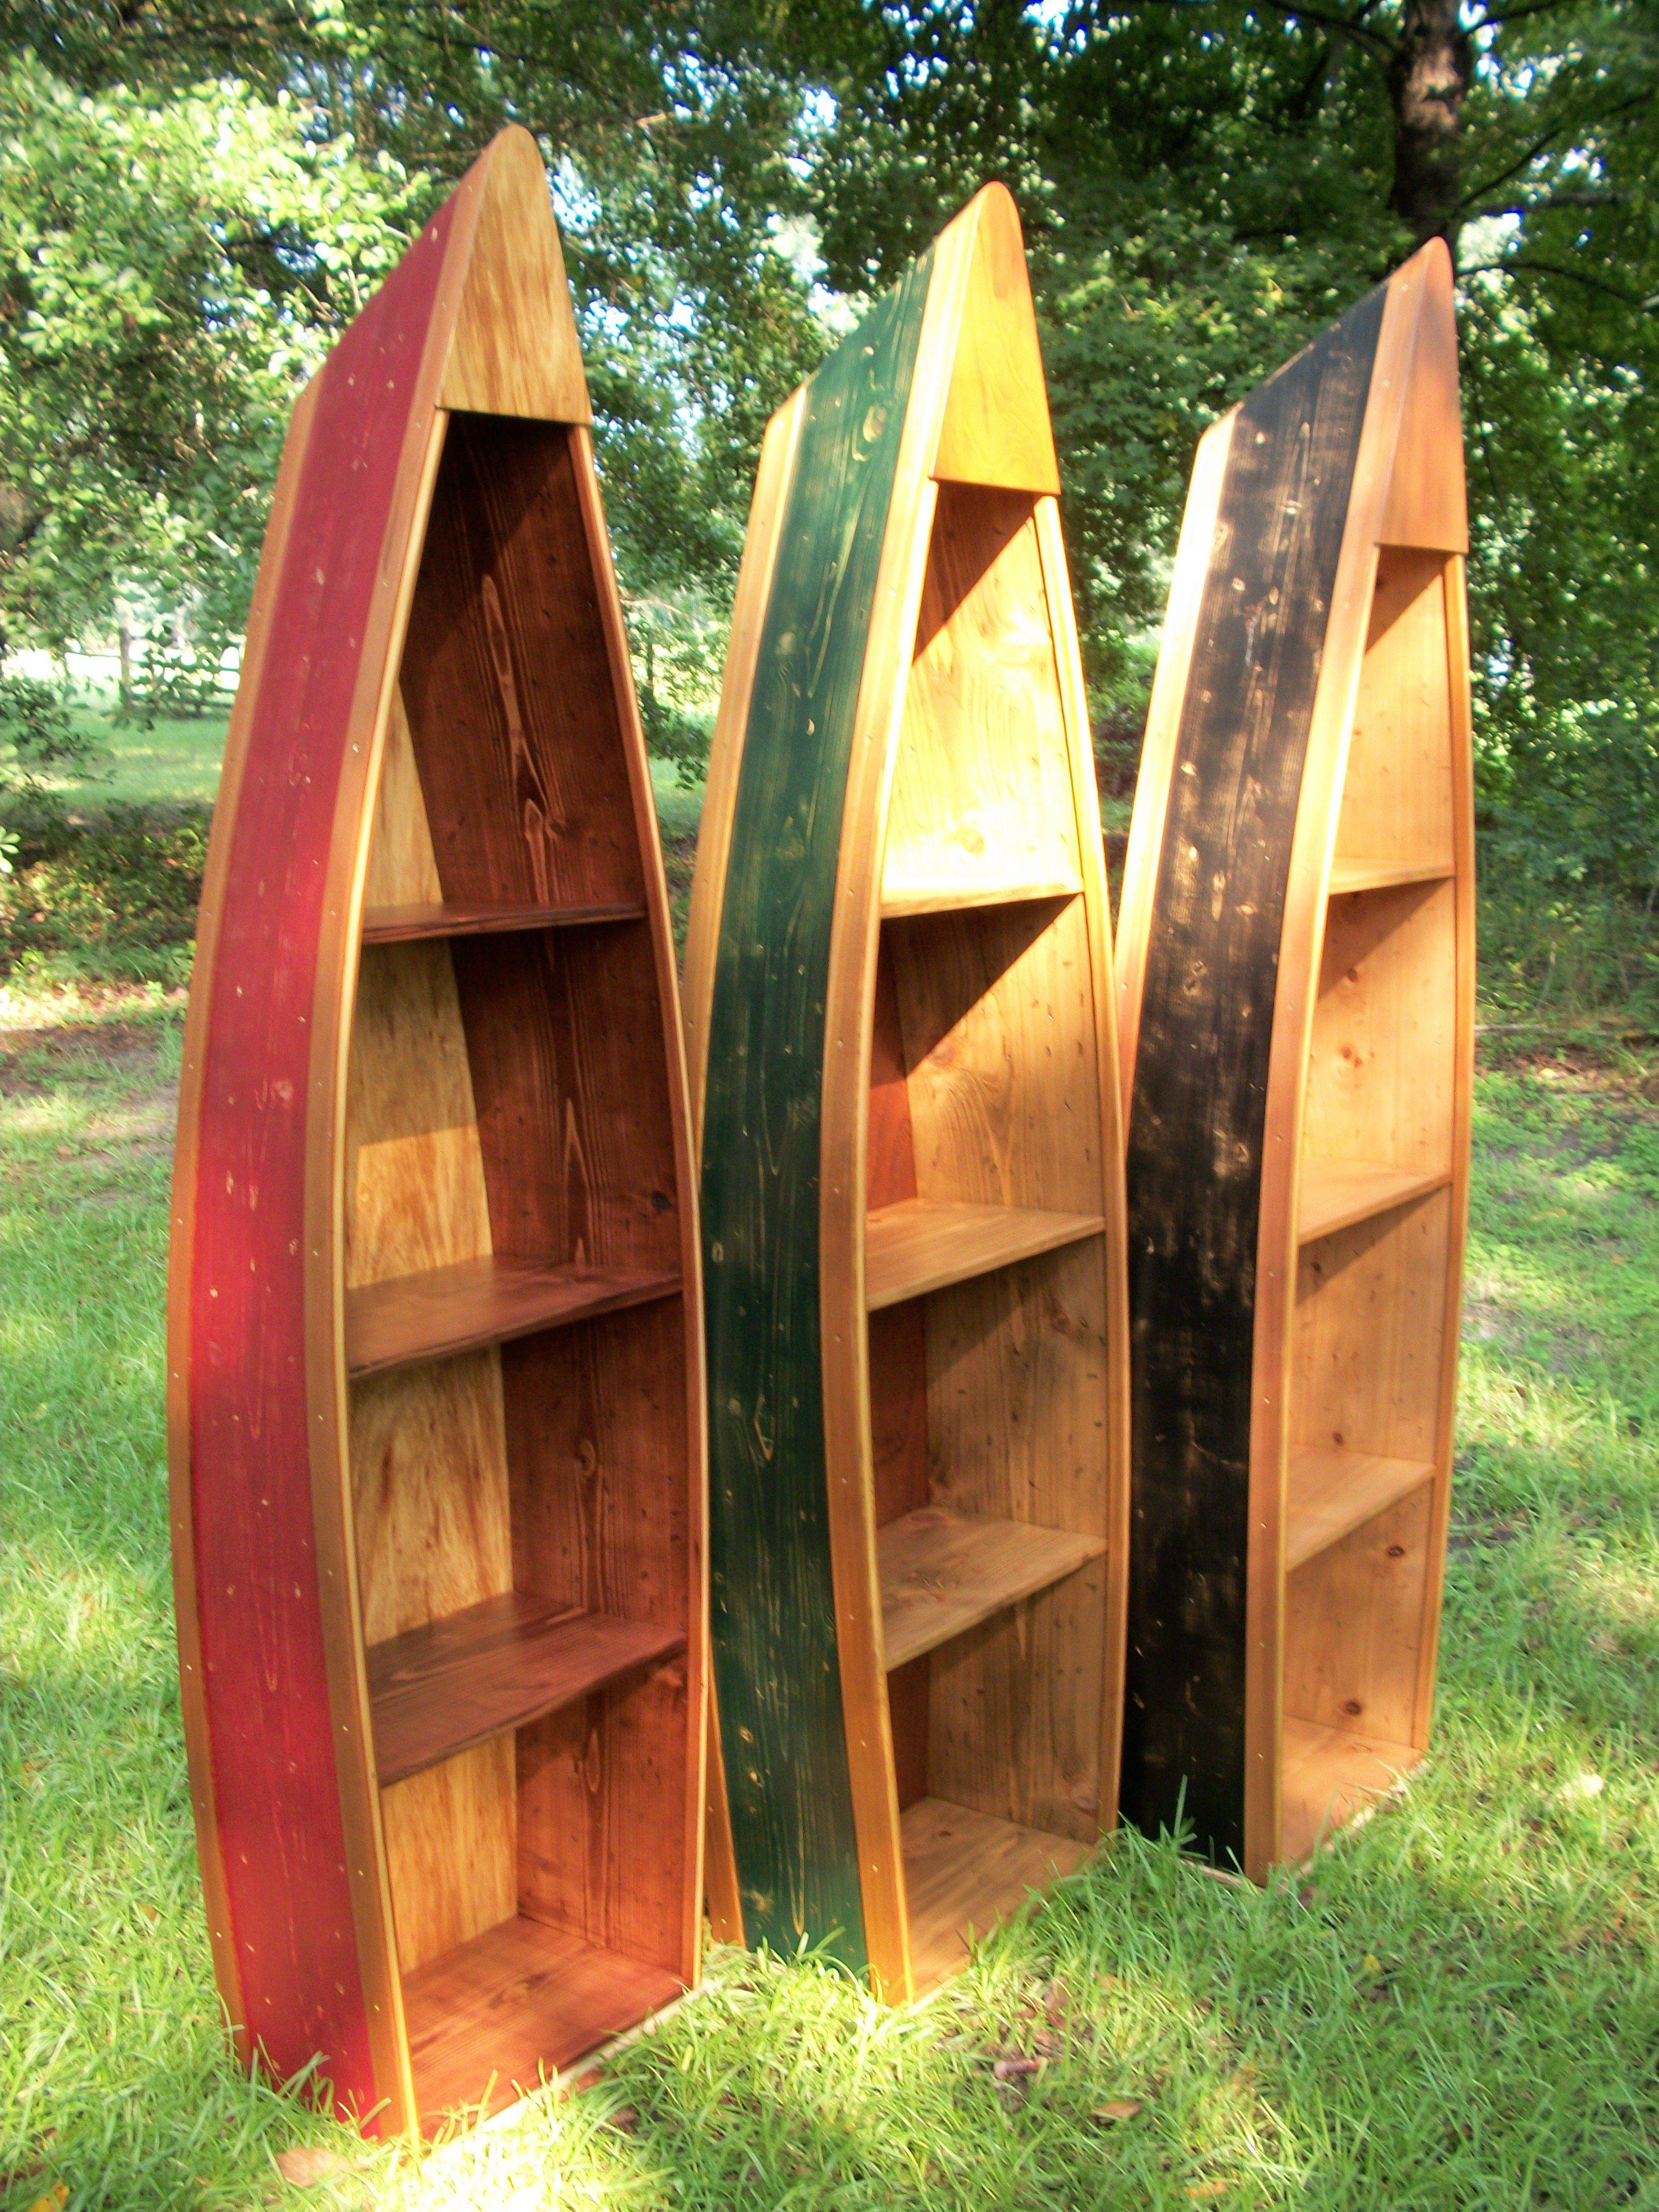 Boat Bookshelf Bookcase Distressed Design Boat Shelf Canoe Shelves Cabin  Lodge Decor